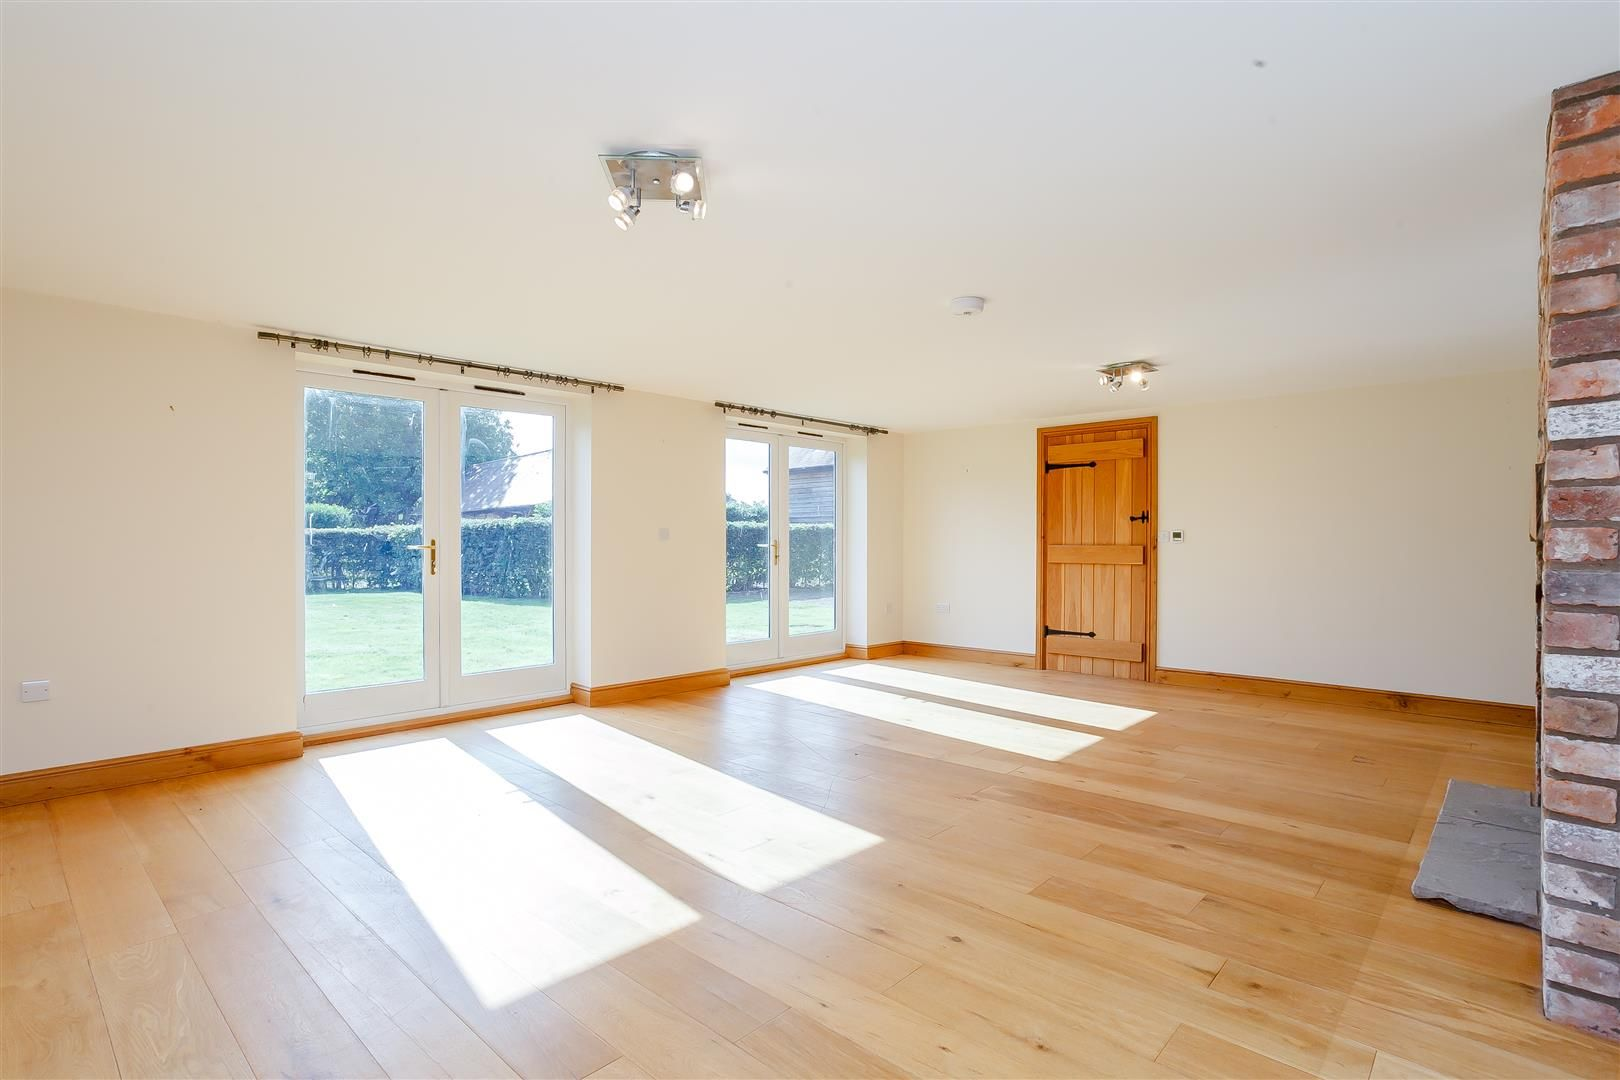 4 bed barn-conversion for sale in Pembridge 7